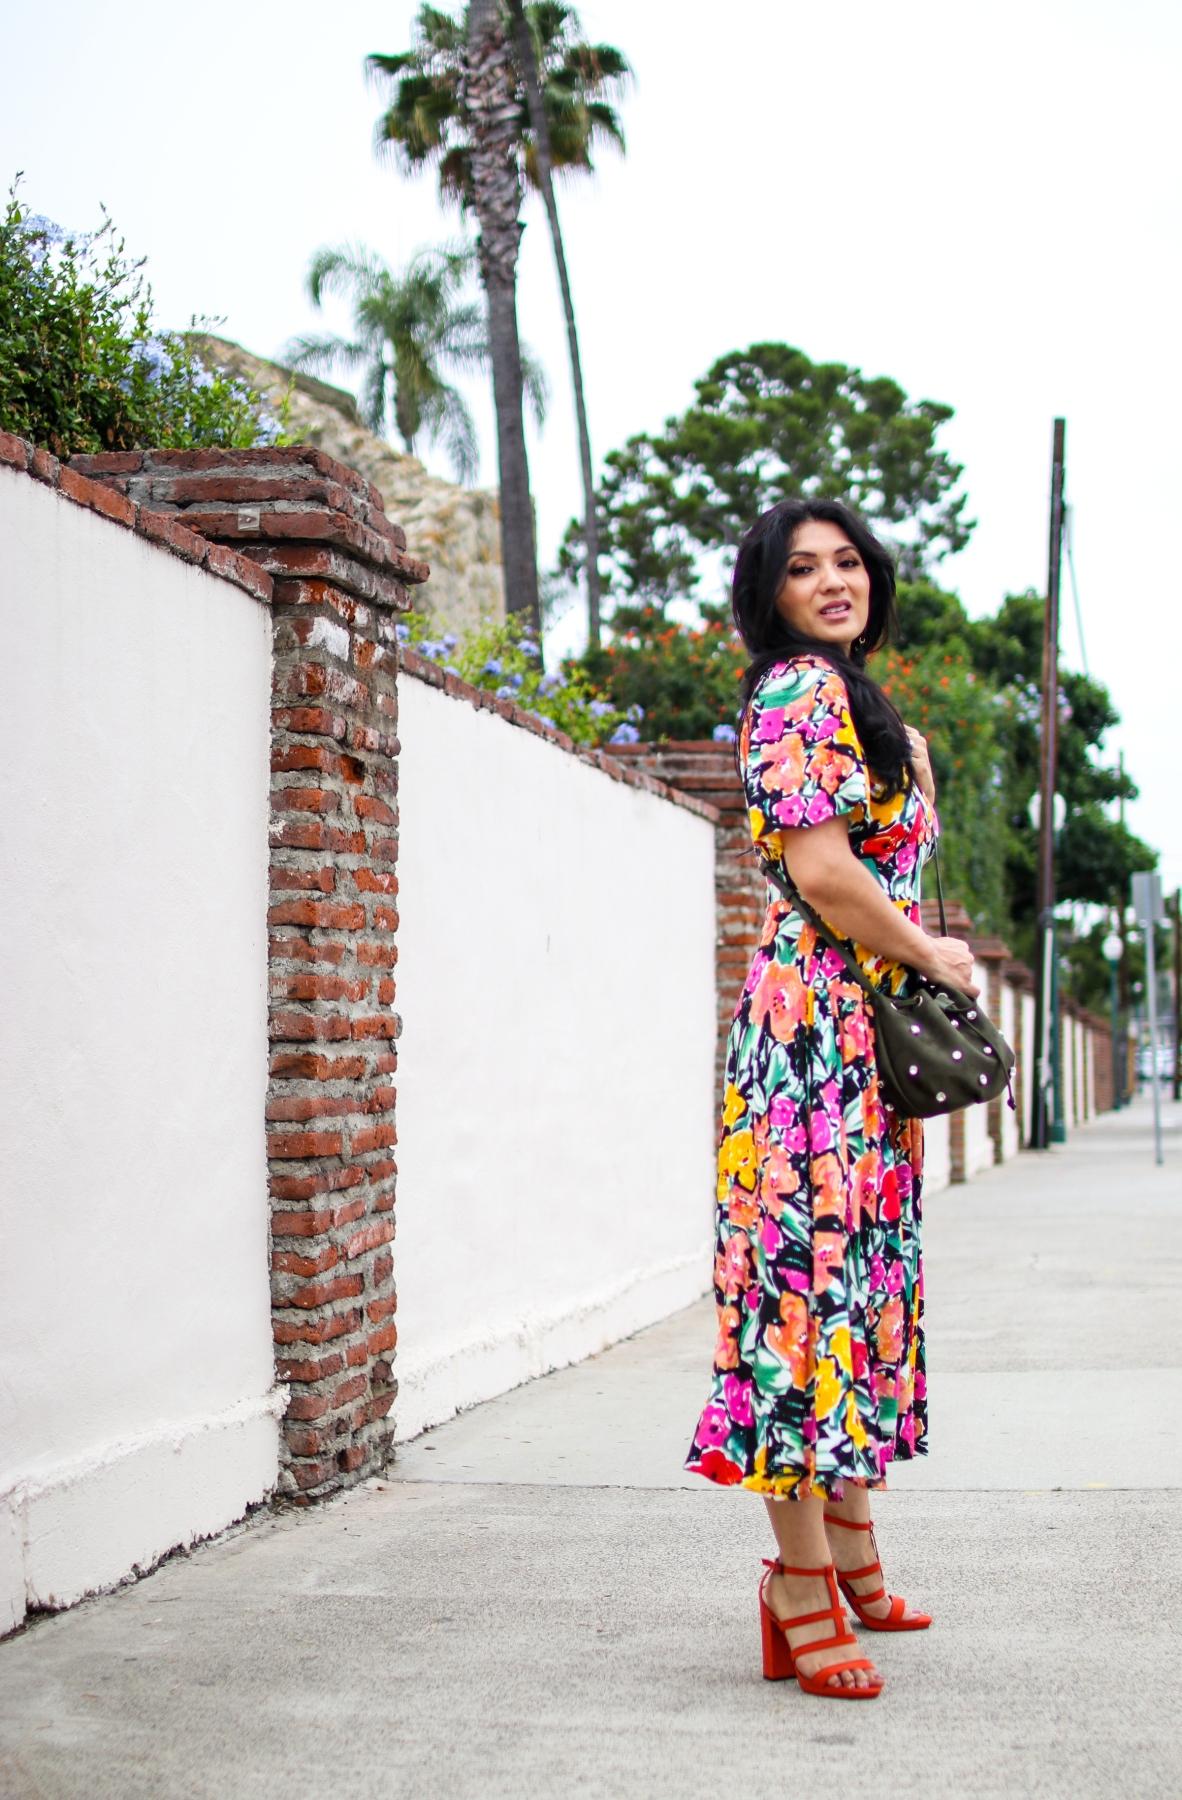 SHEIN BRIGHT FLORAL DRESS